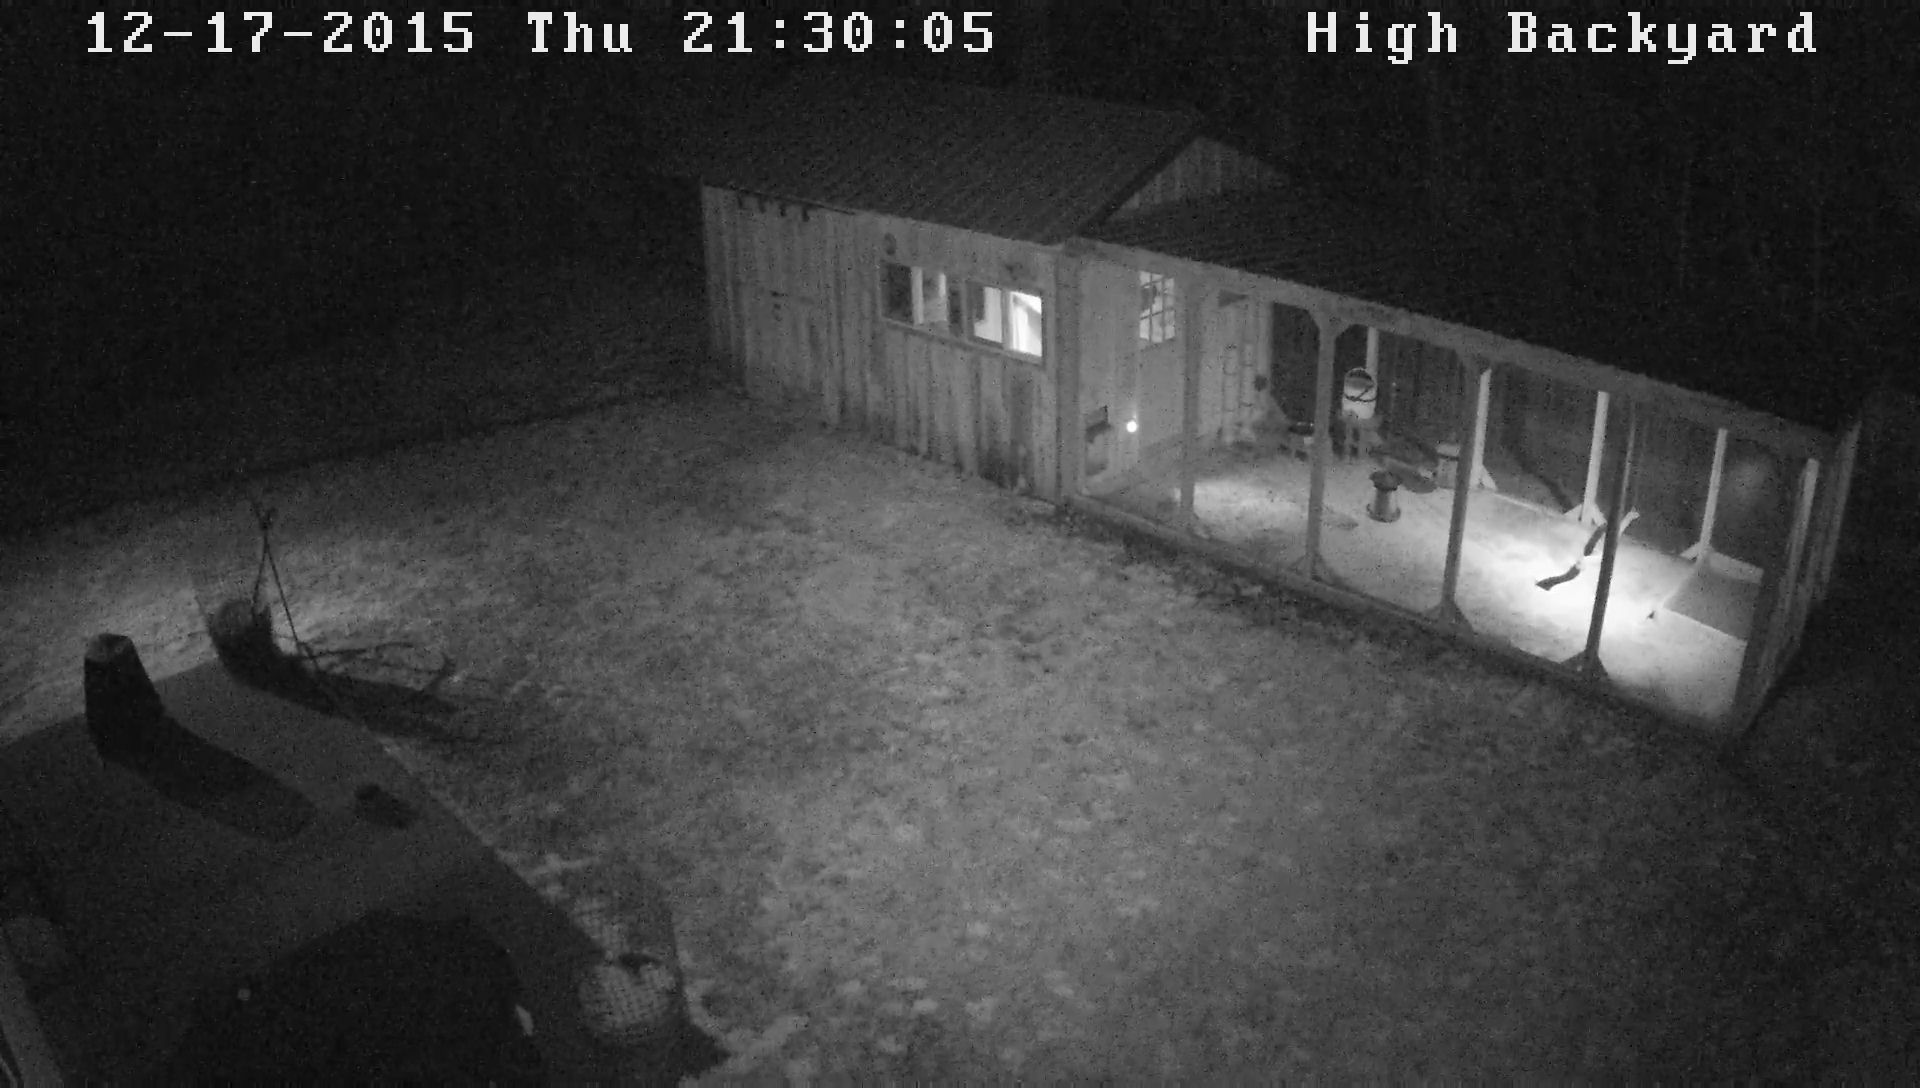 security cameras backyard chickens